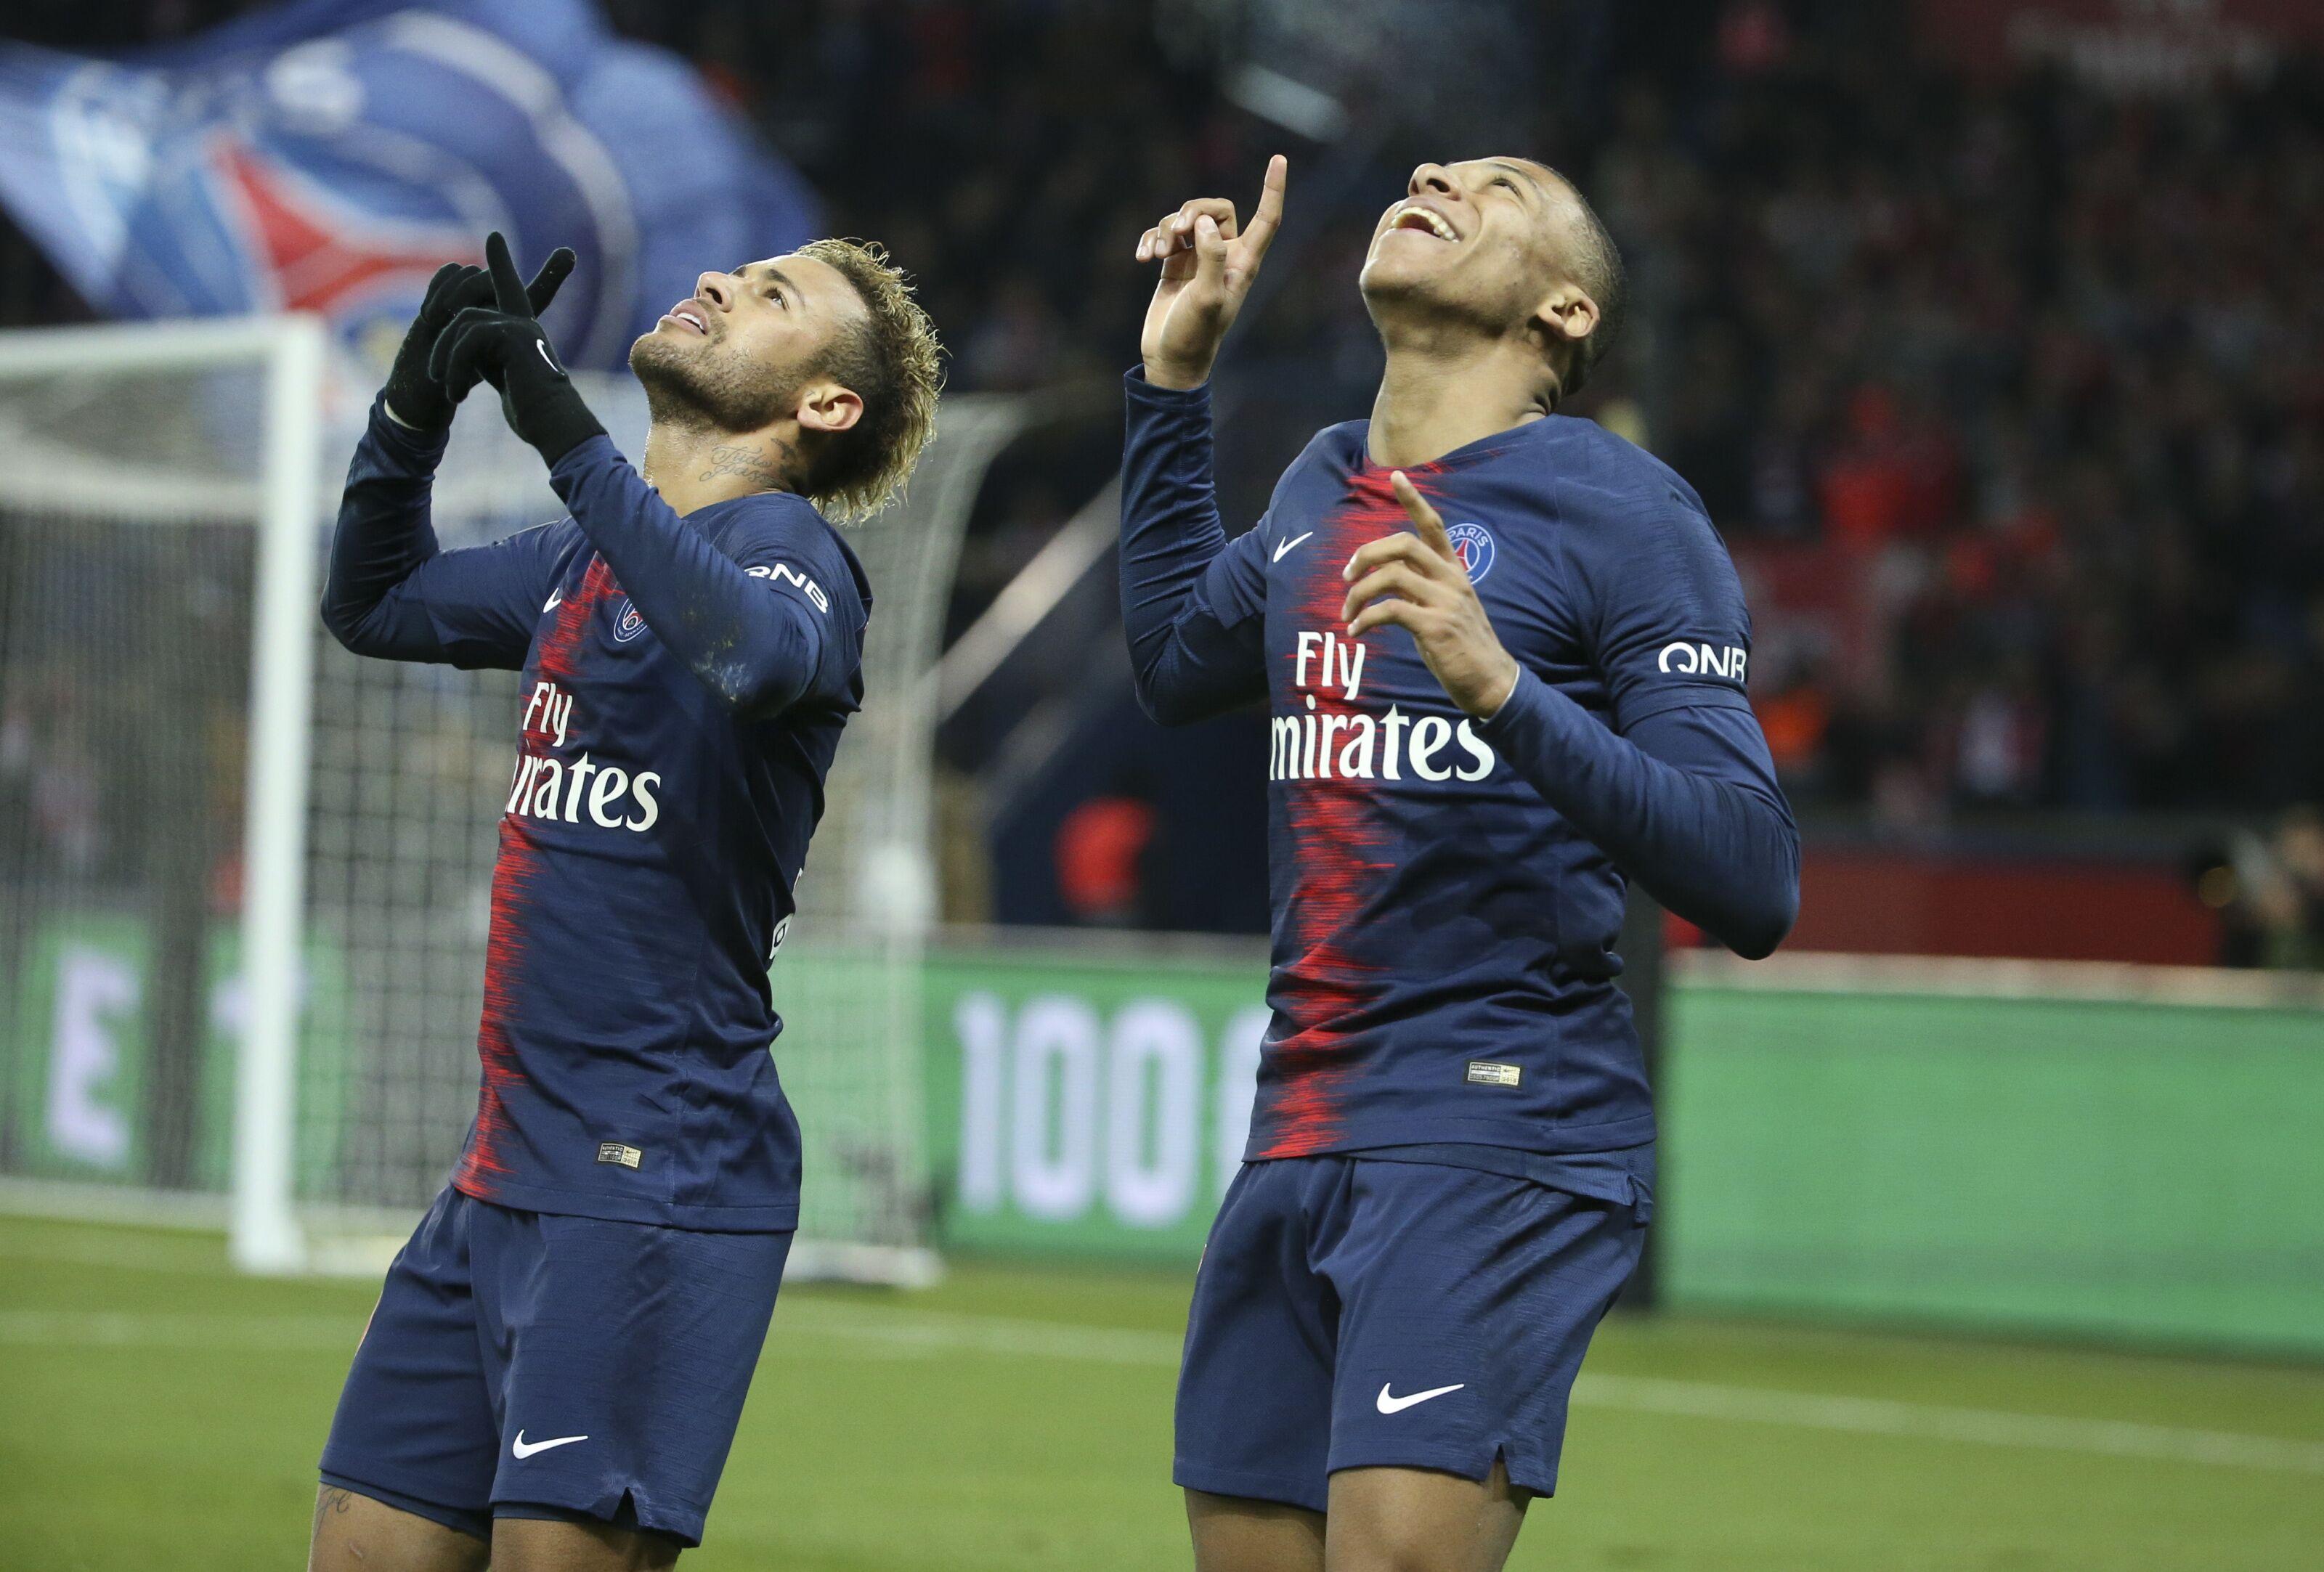 Five reasons why Real Madrid should choose Kylian Mbappe over Neymar